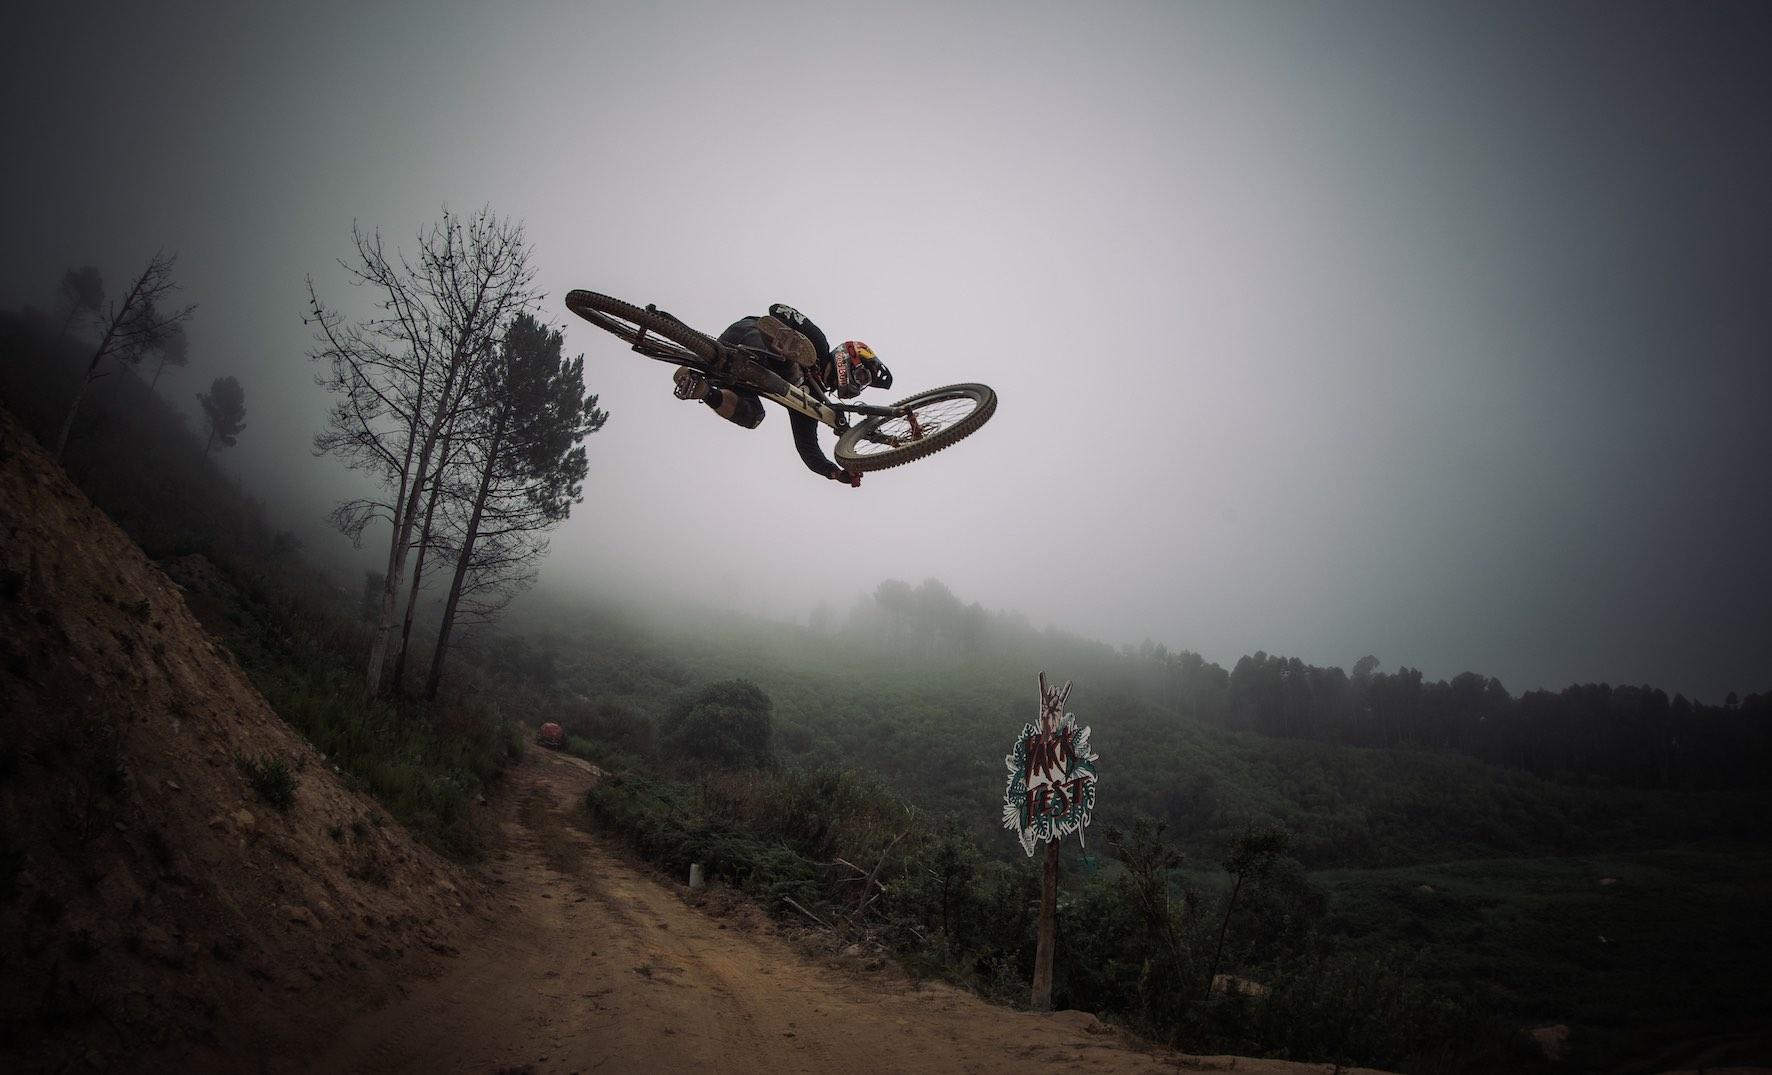 Andreu Lacondeguy riding the 2019 DarkFEST Freeride Mountain Bike course